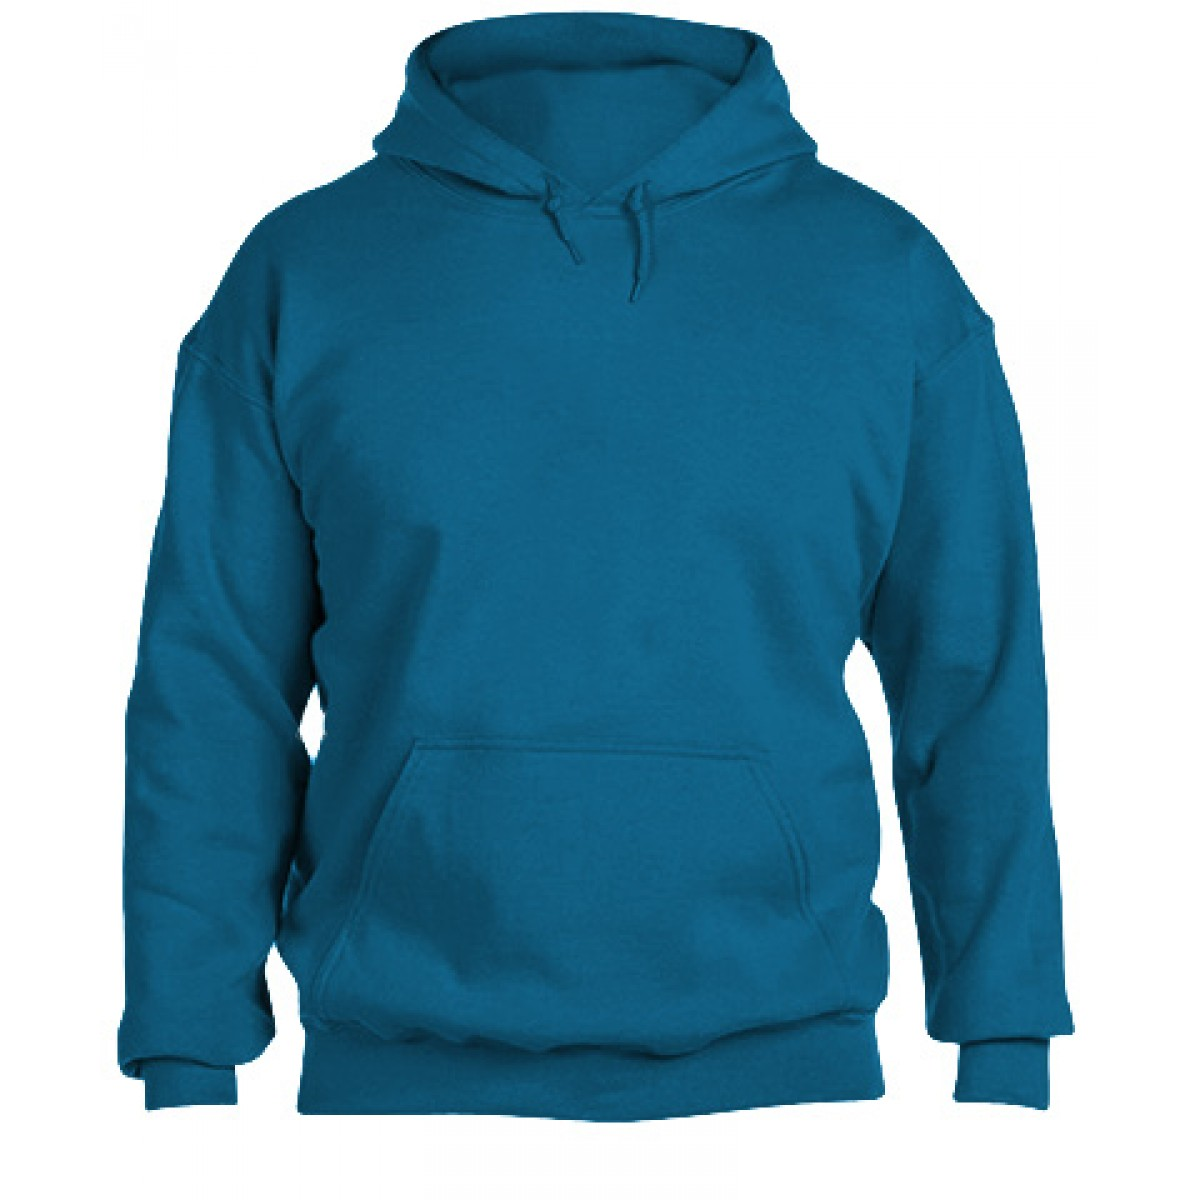 Hooded Sweatshirt 50/50 Heavy Blend -Sapphire-S